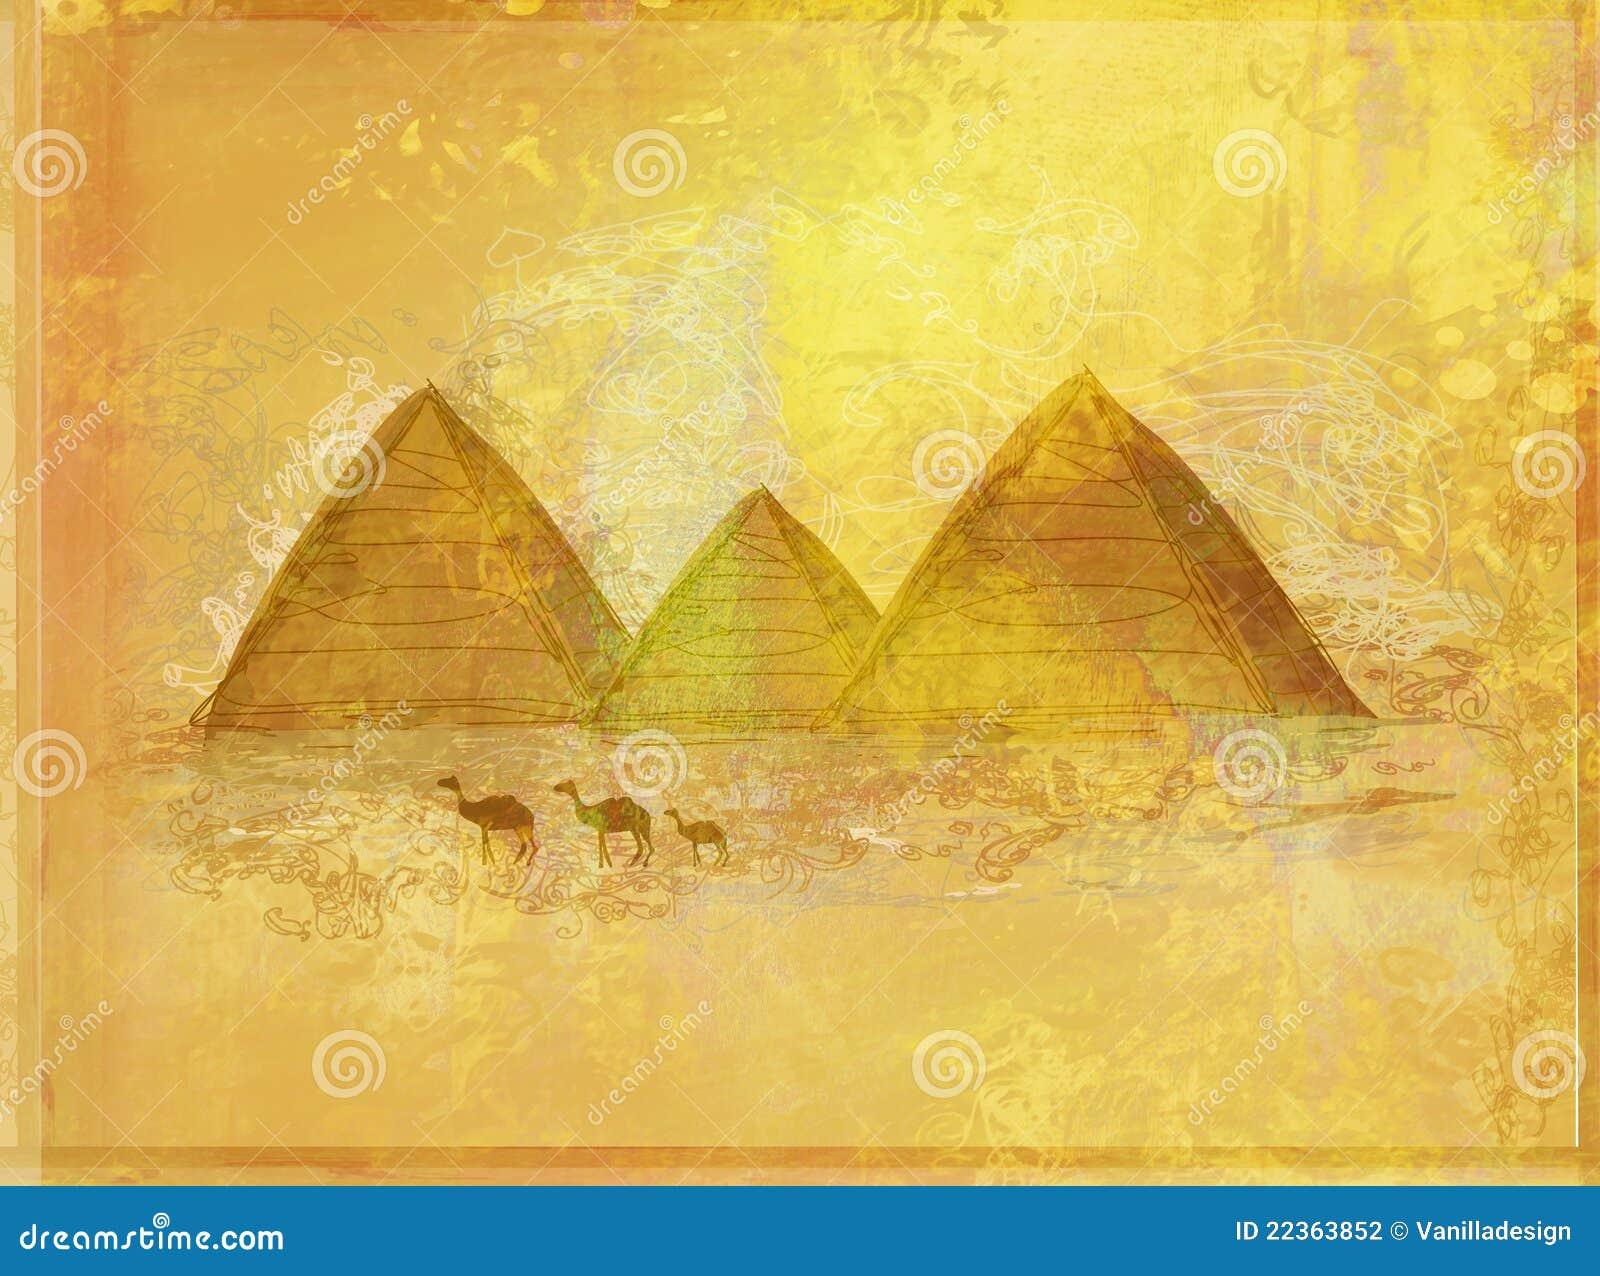 Essays on egyptian pyramids